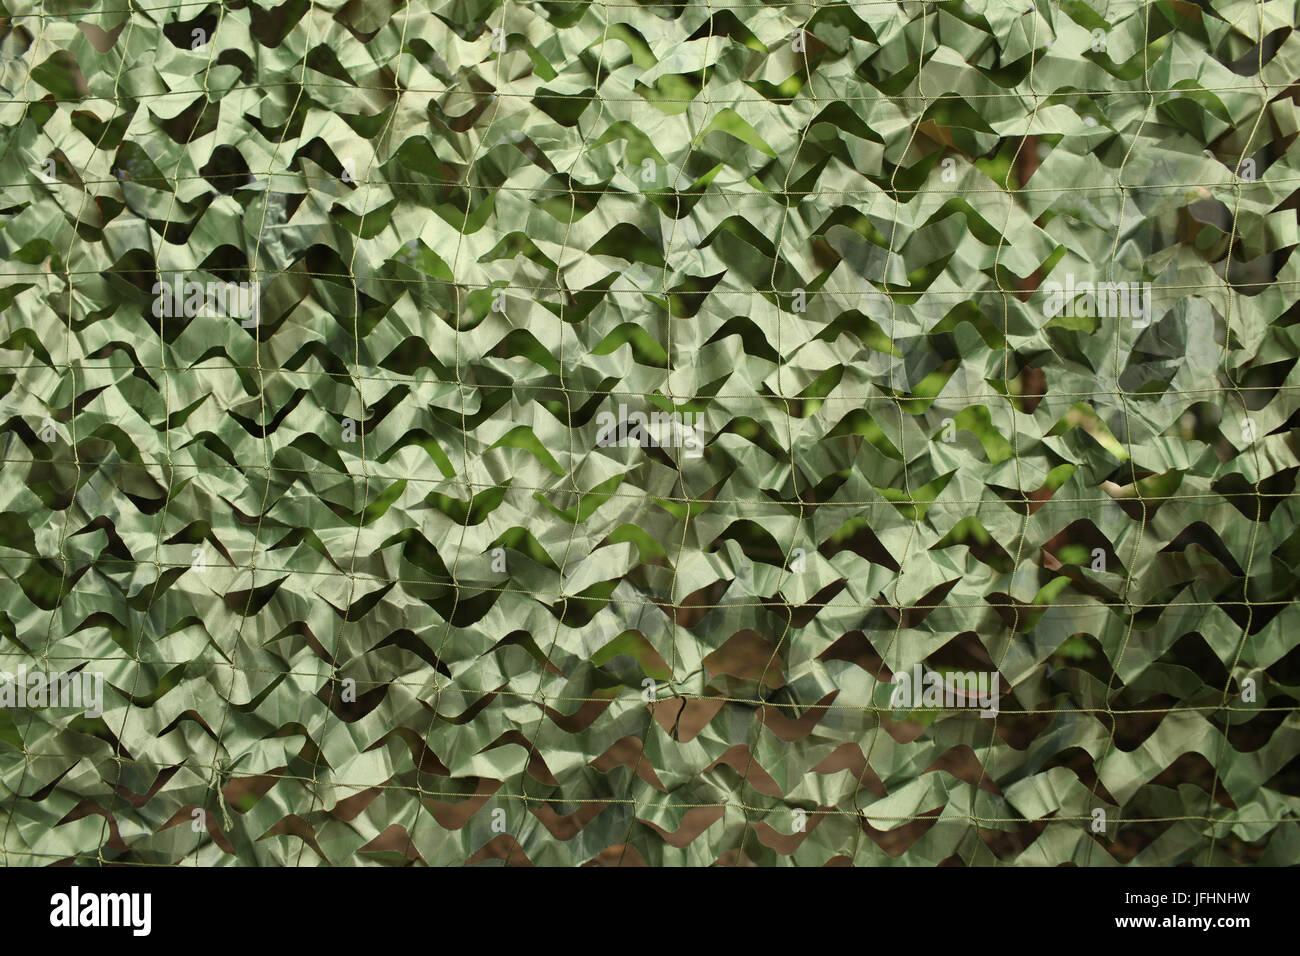 military camouflage net background - Stock Image